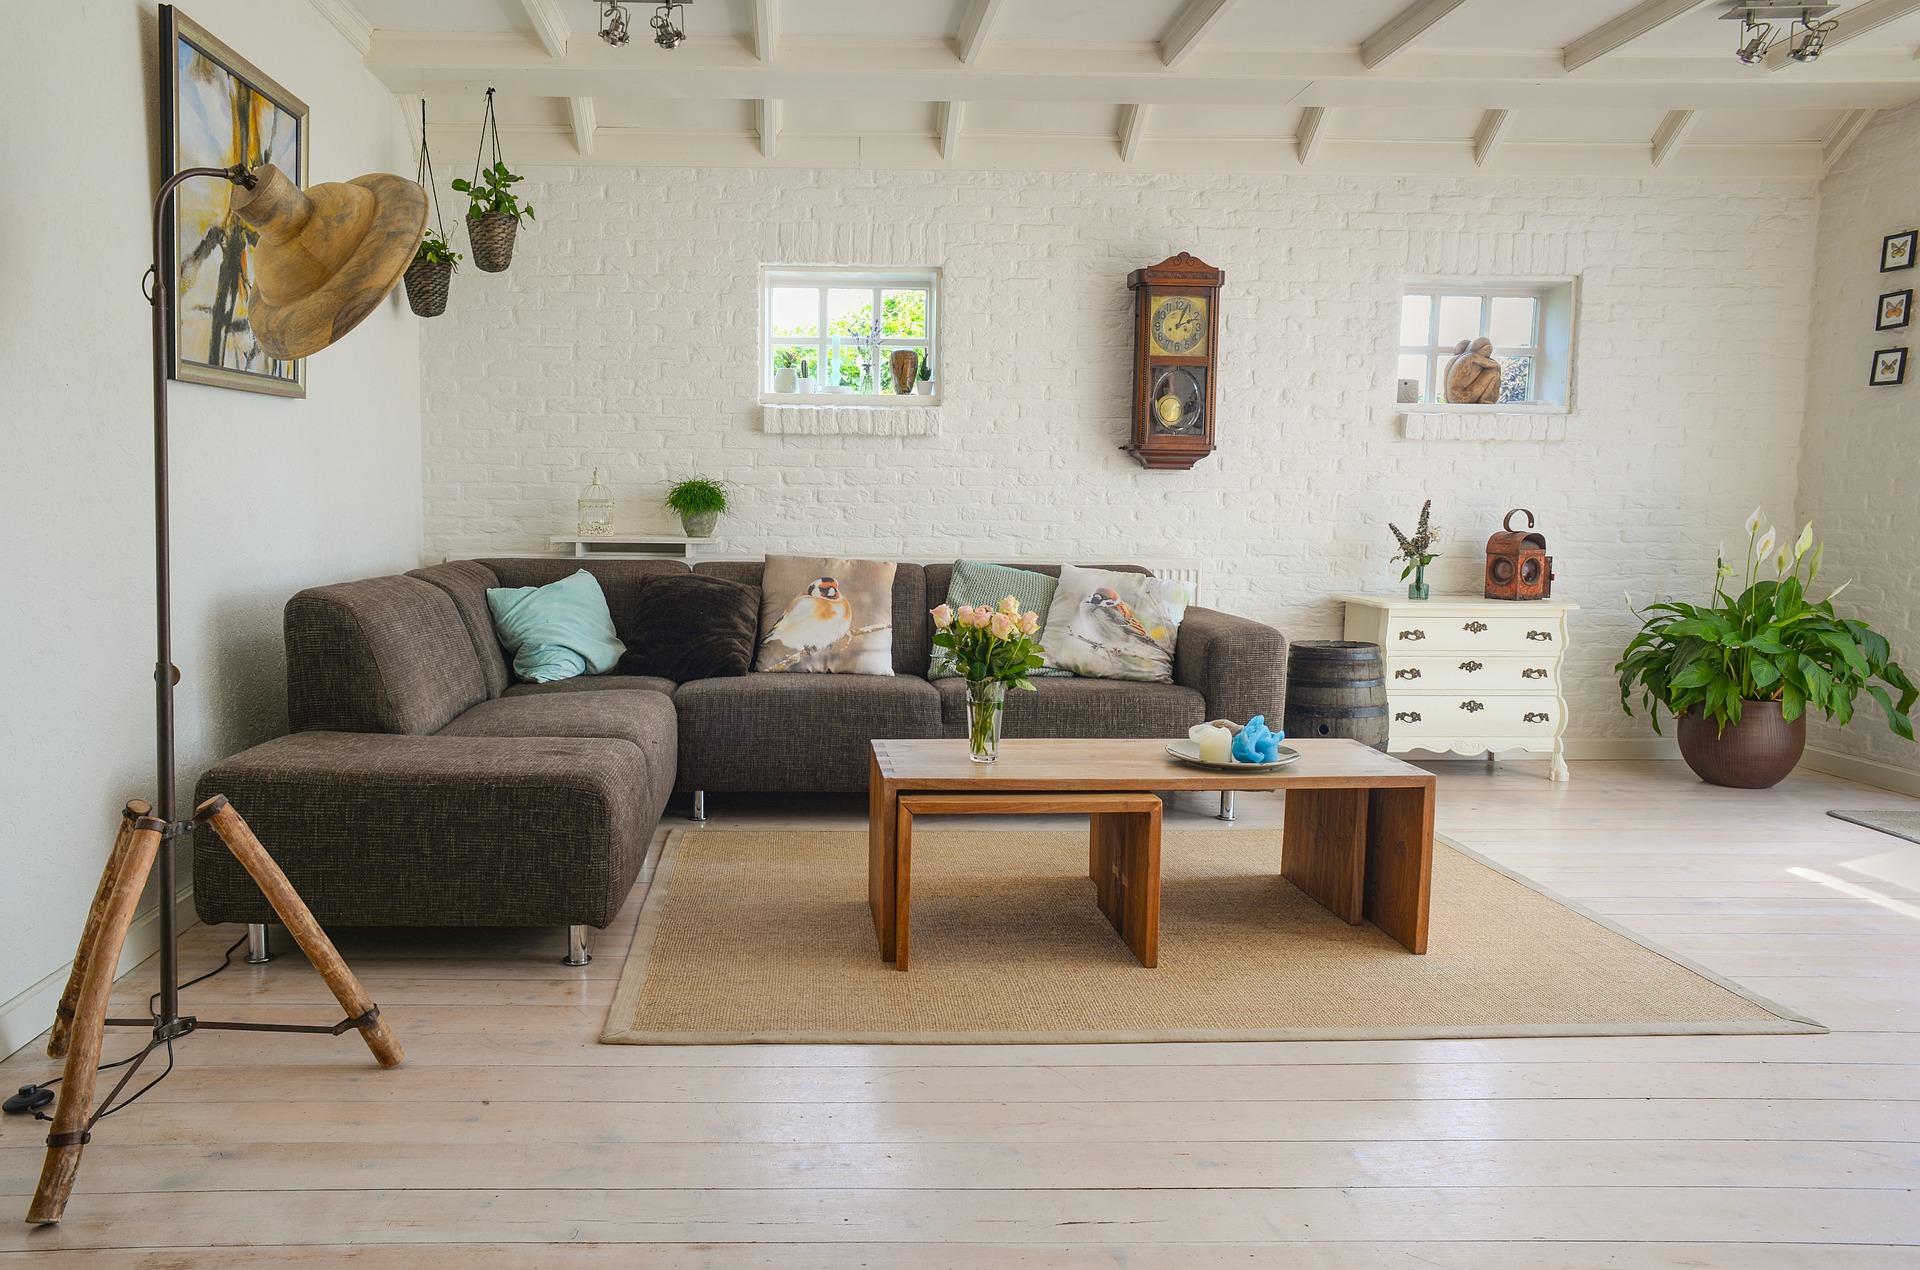 2 living-room-2732939_1920 (2)